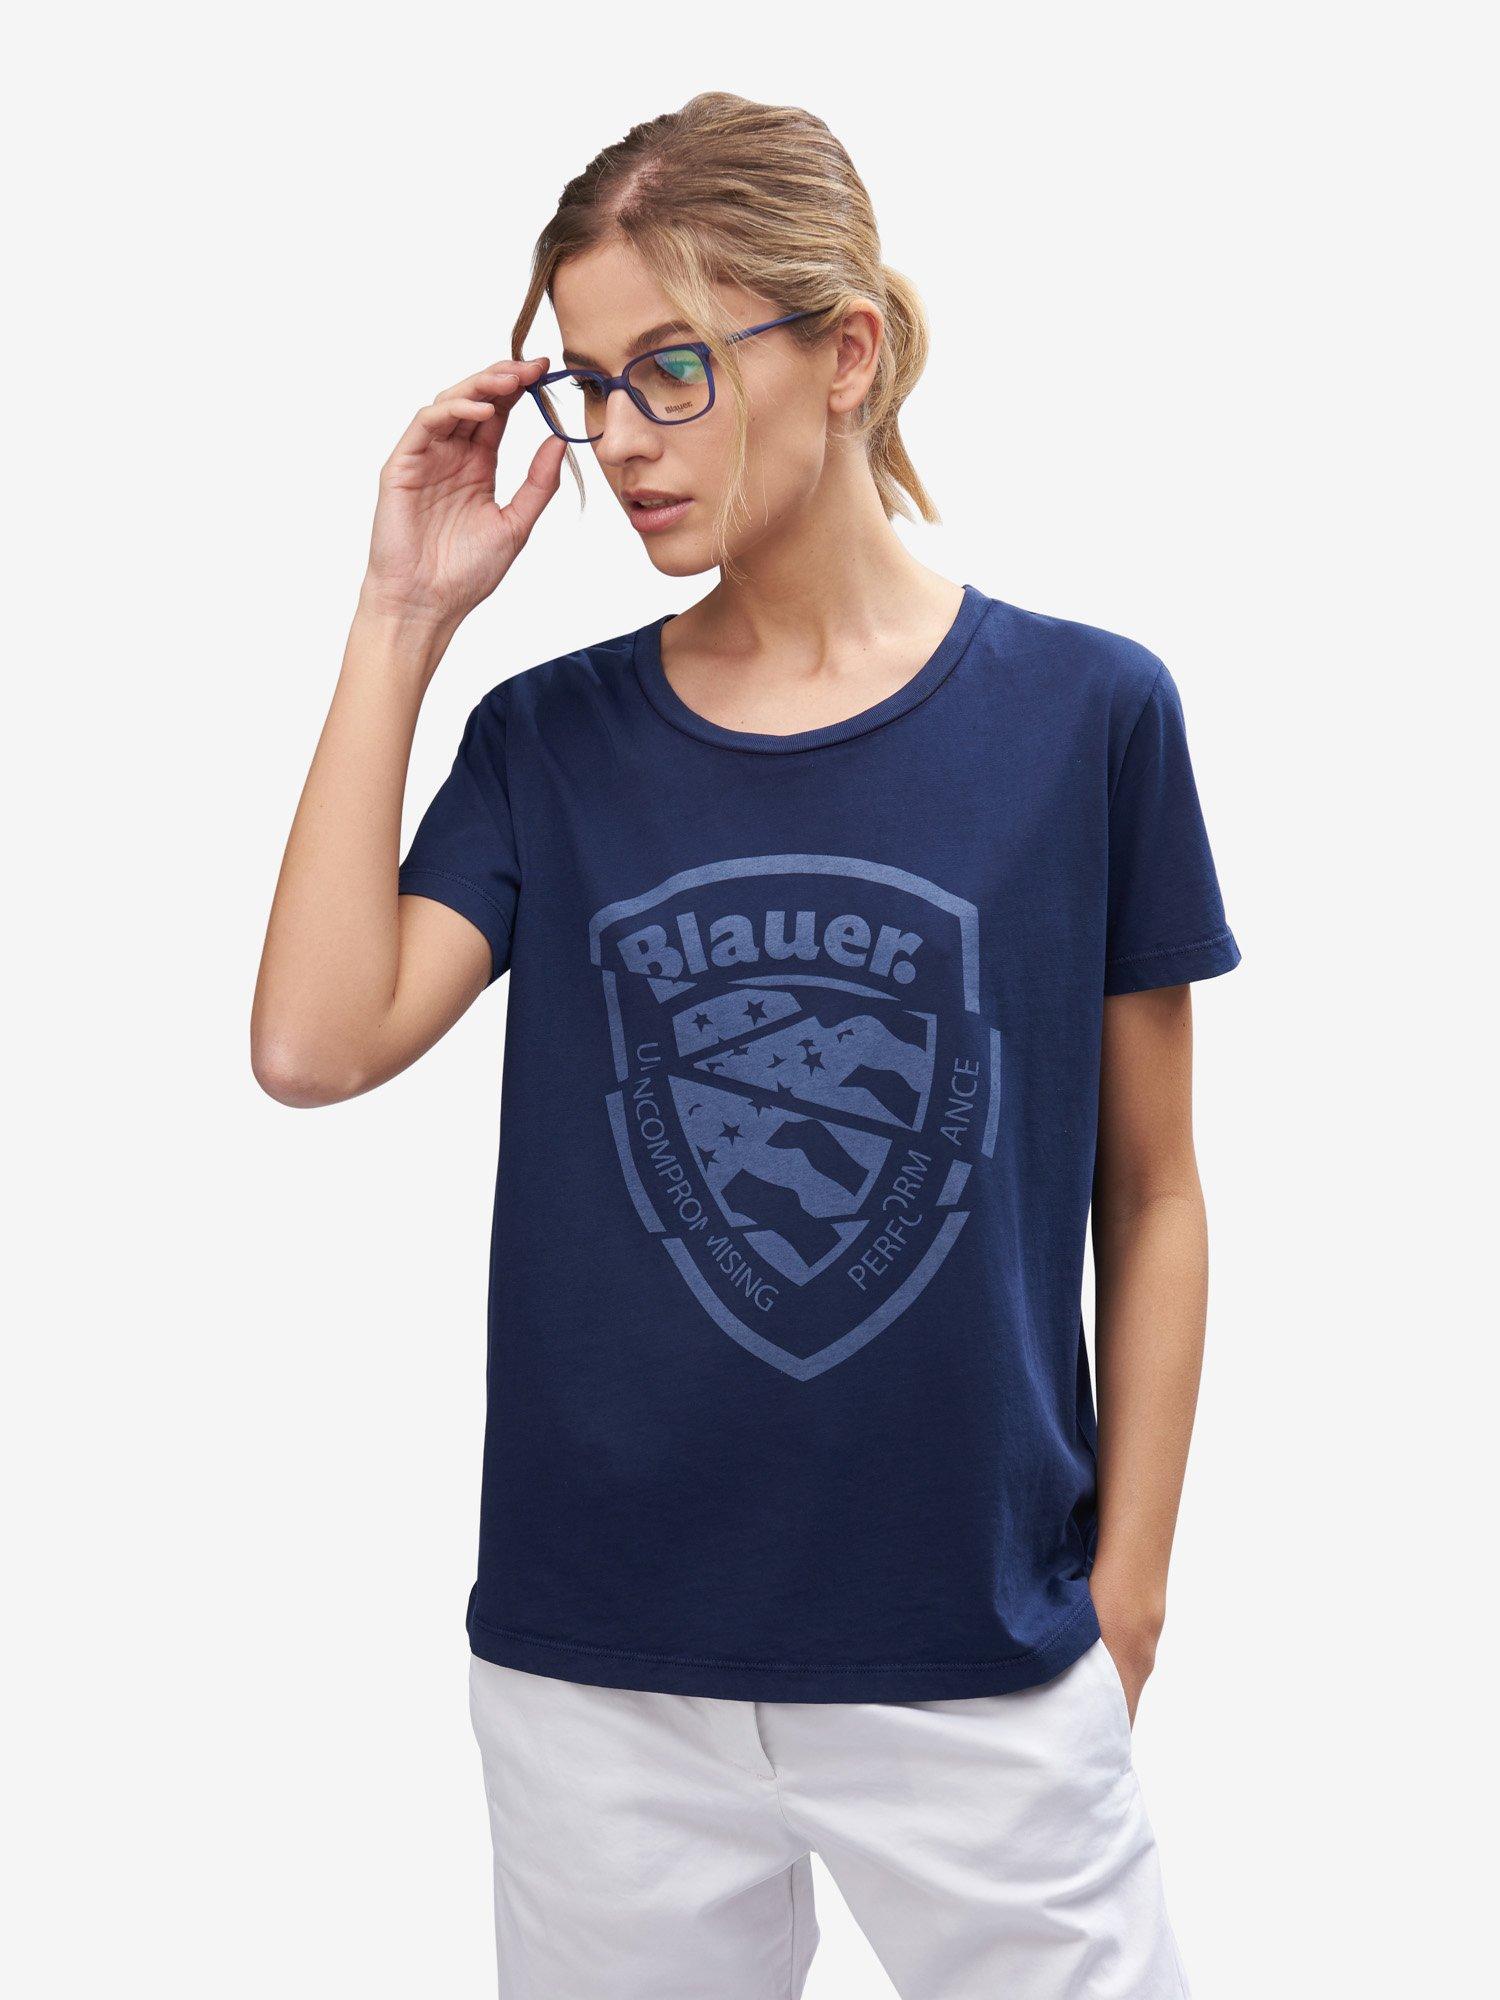 T-SHIRT MANCHE COURTE - Blauer